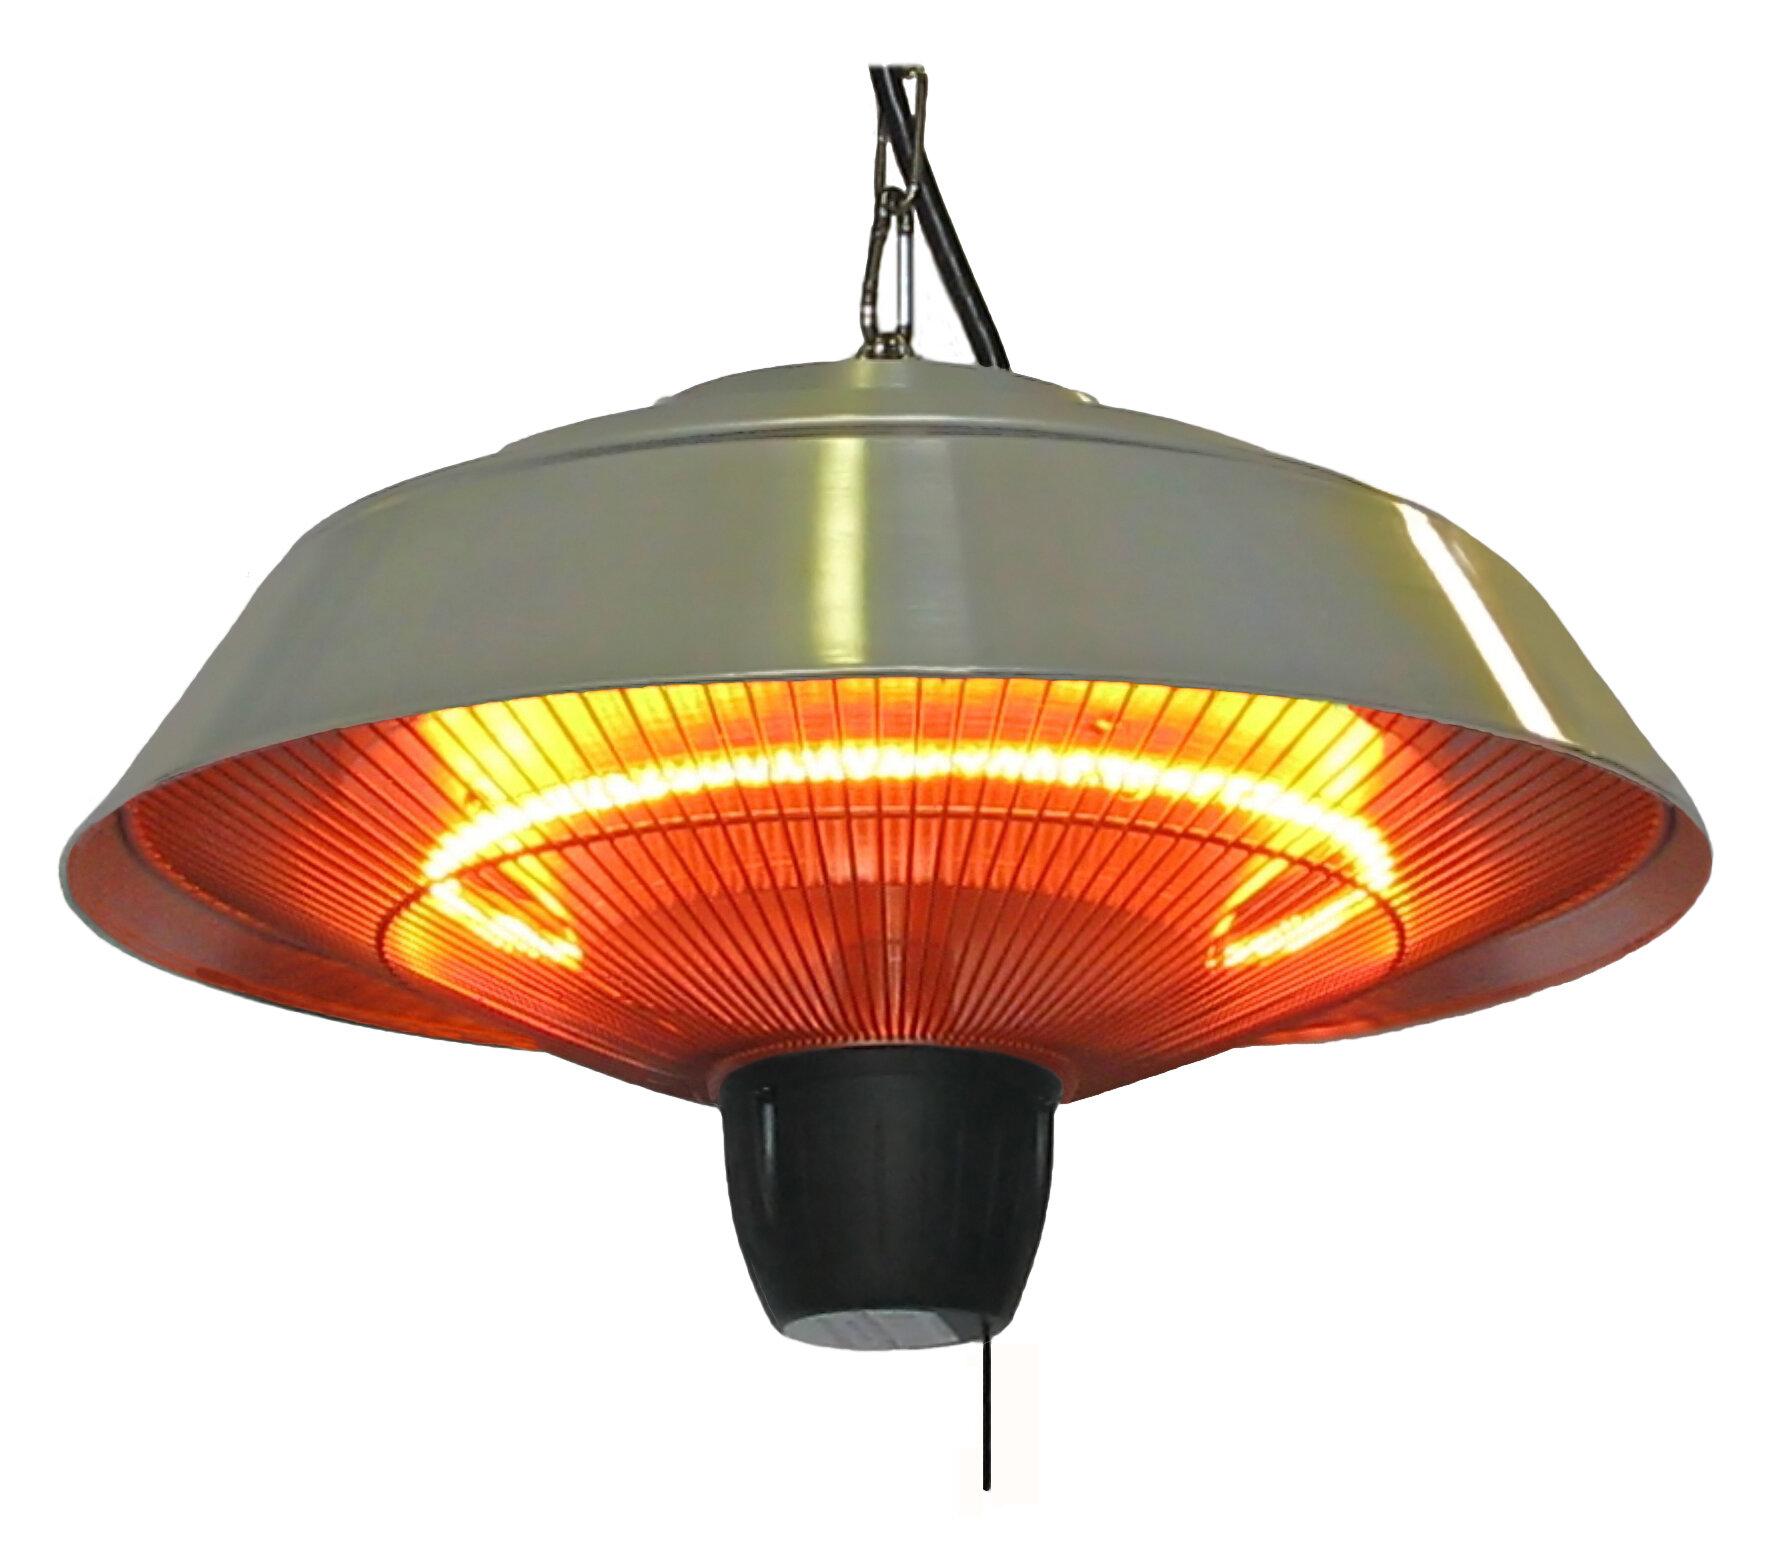 Beau EnerG+ 1500 Watt Electric Hanging Patio Heater U0026 Reviews | Wayfair